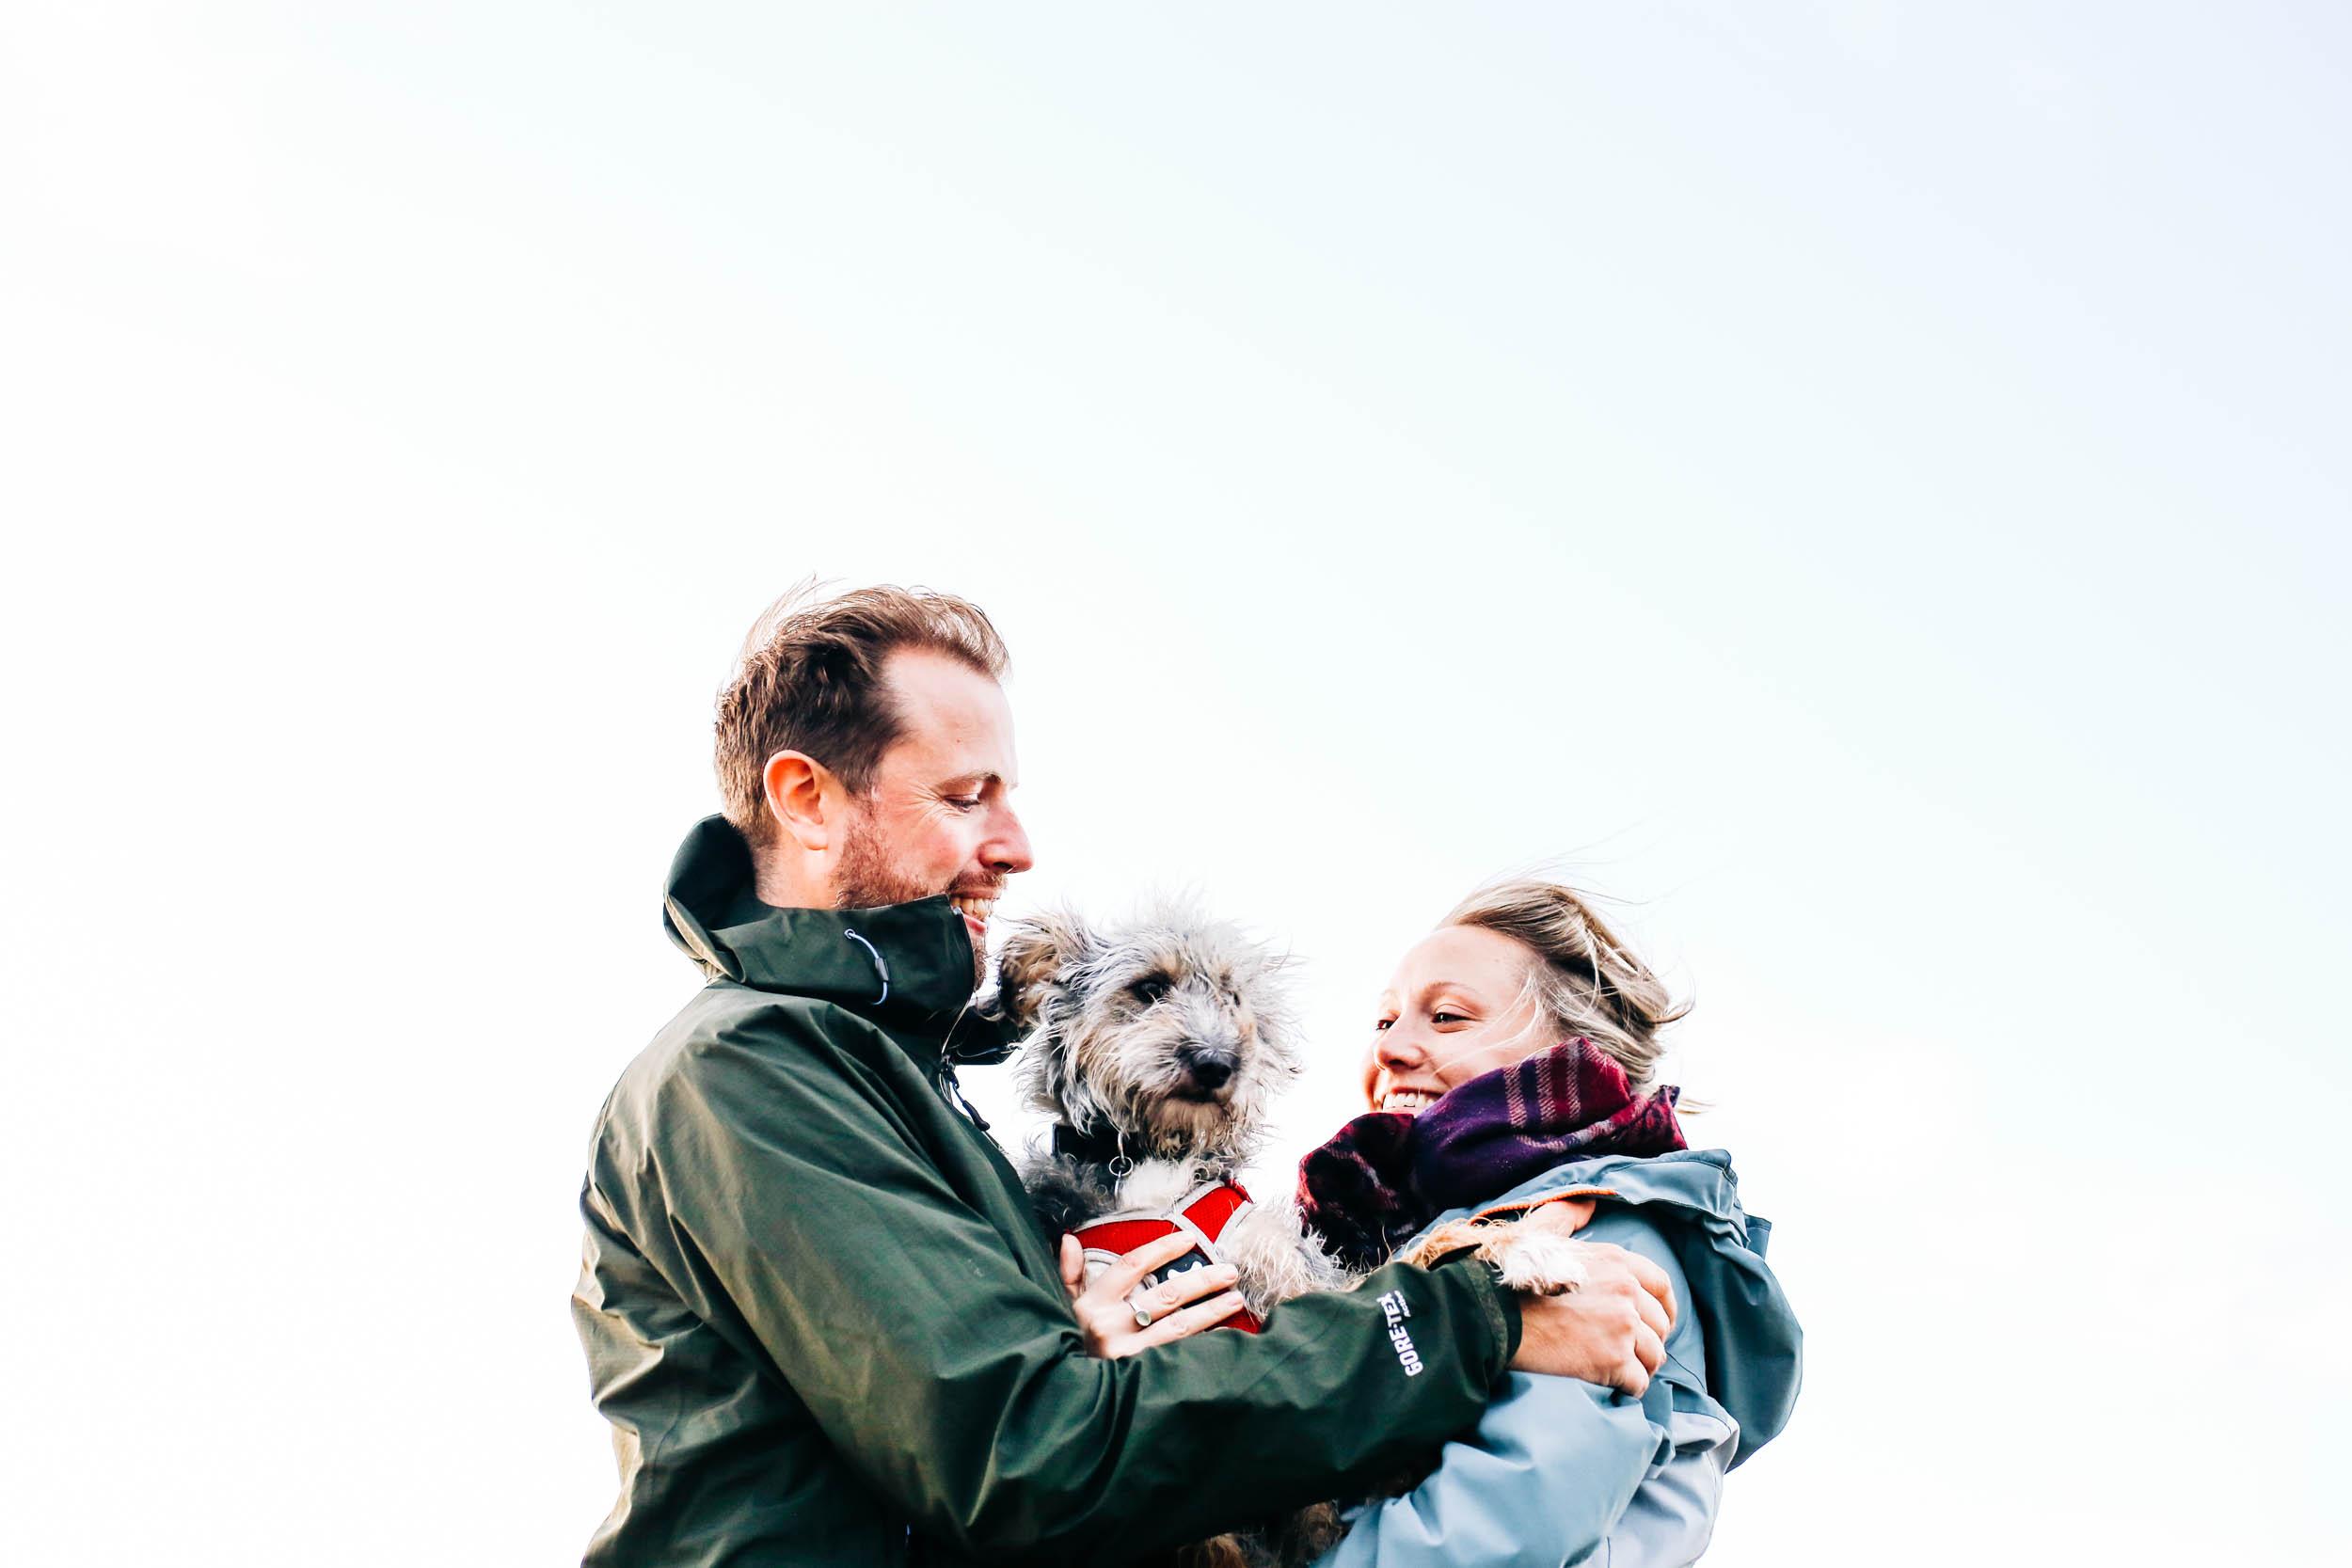 Alex_Sedgmond_Photography-MerthyrMawr-PreweddingPhotography-Penny&Mike-14.jpg